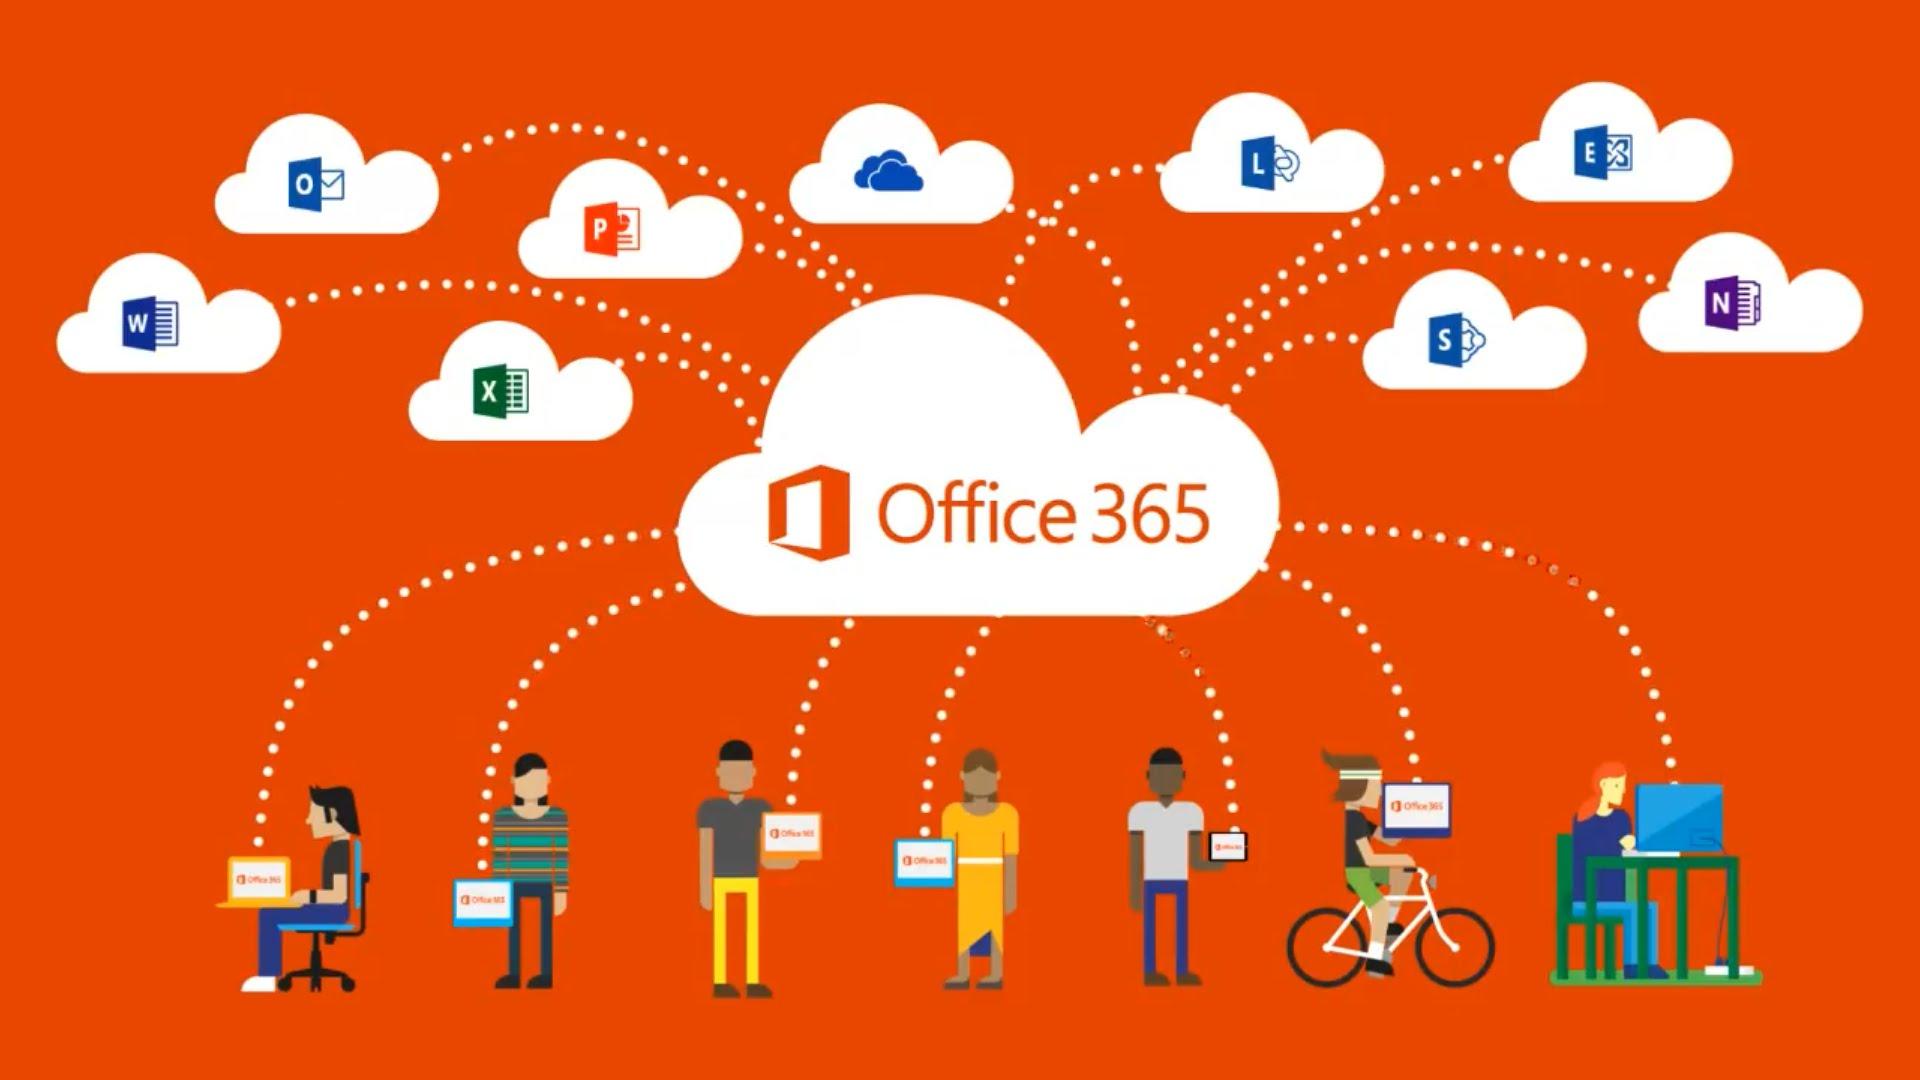 Office 365 Menyederhanakan Hidup Anda